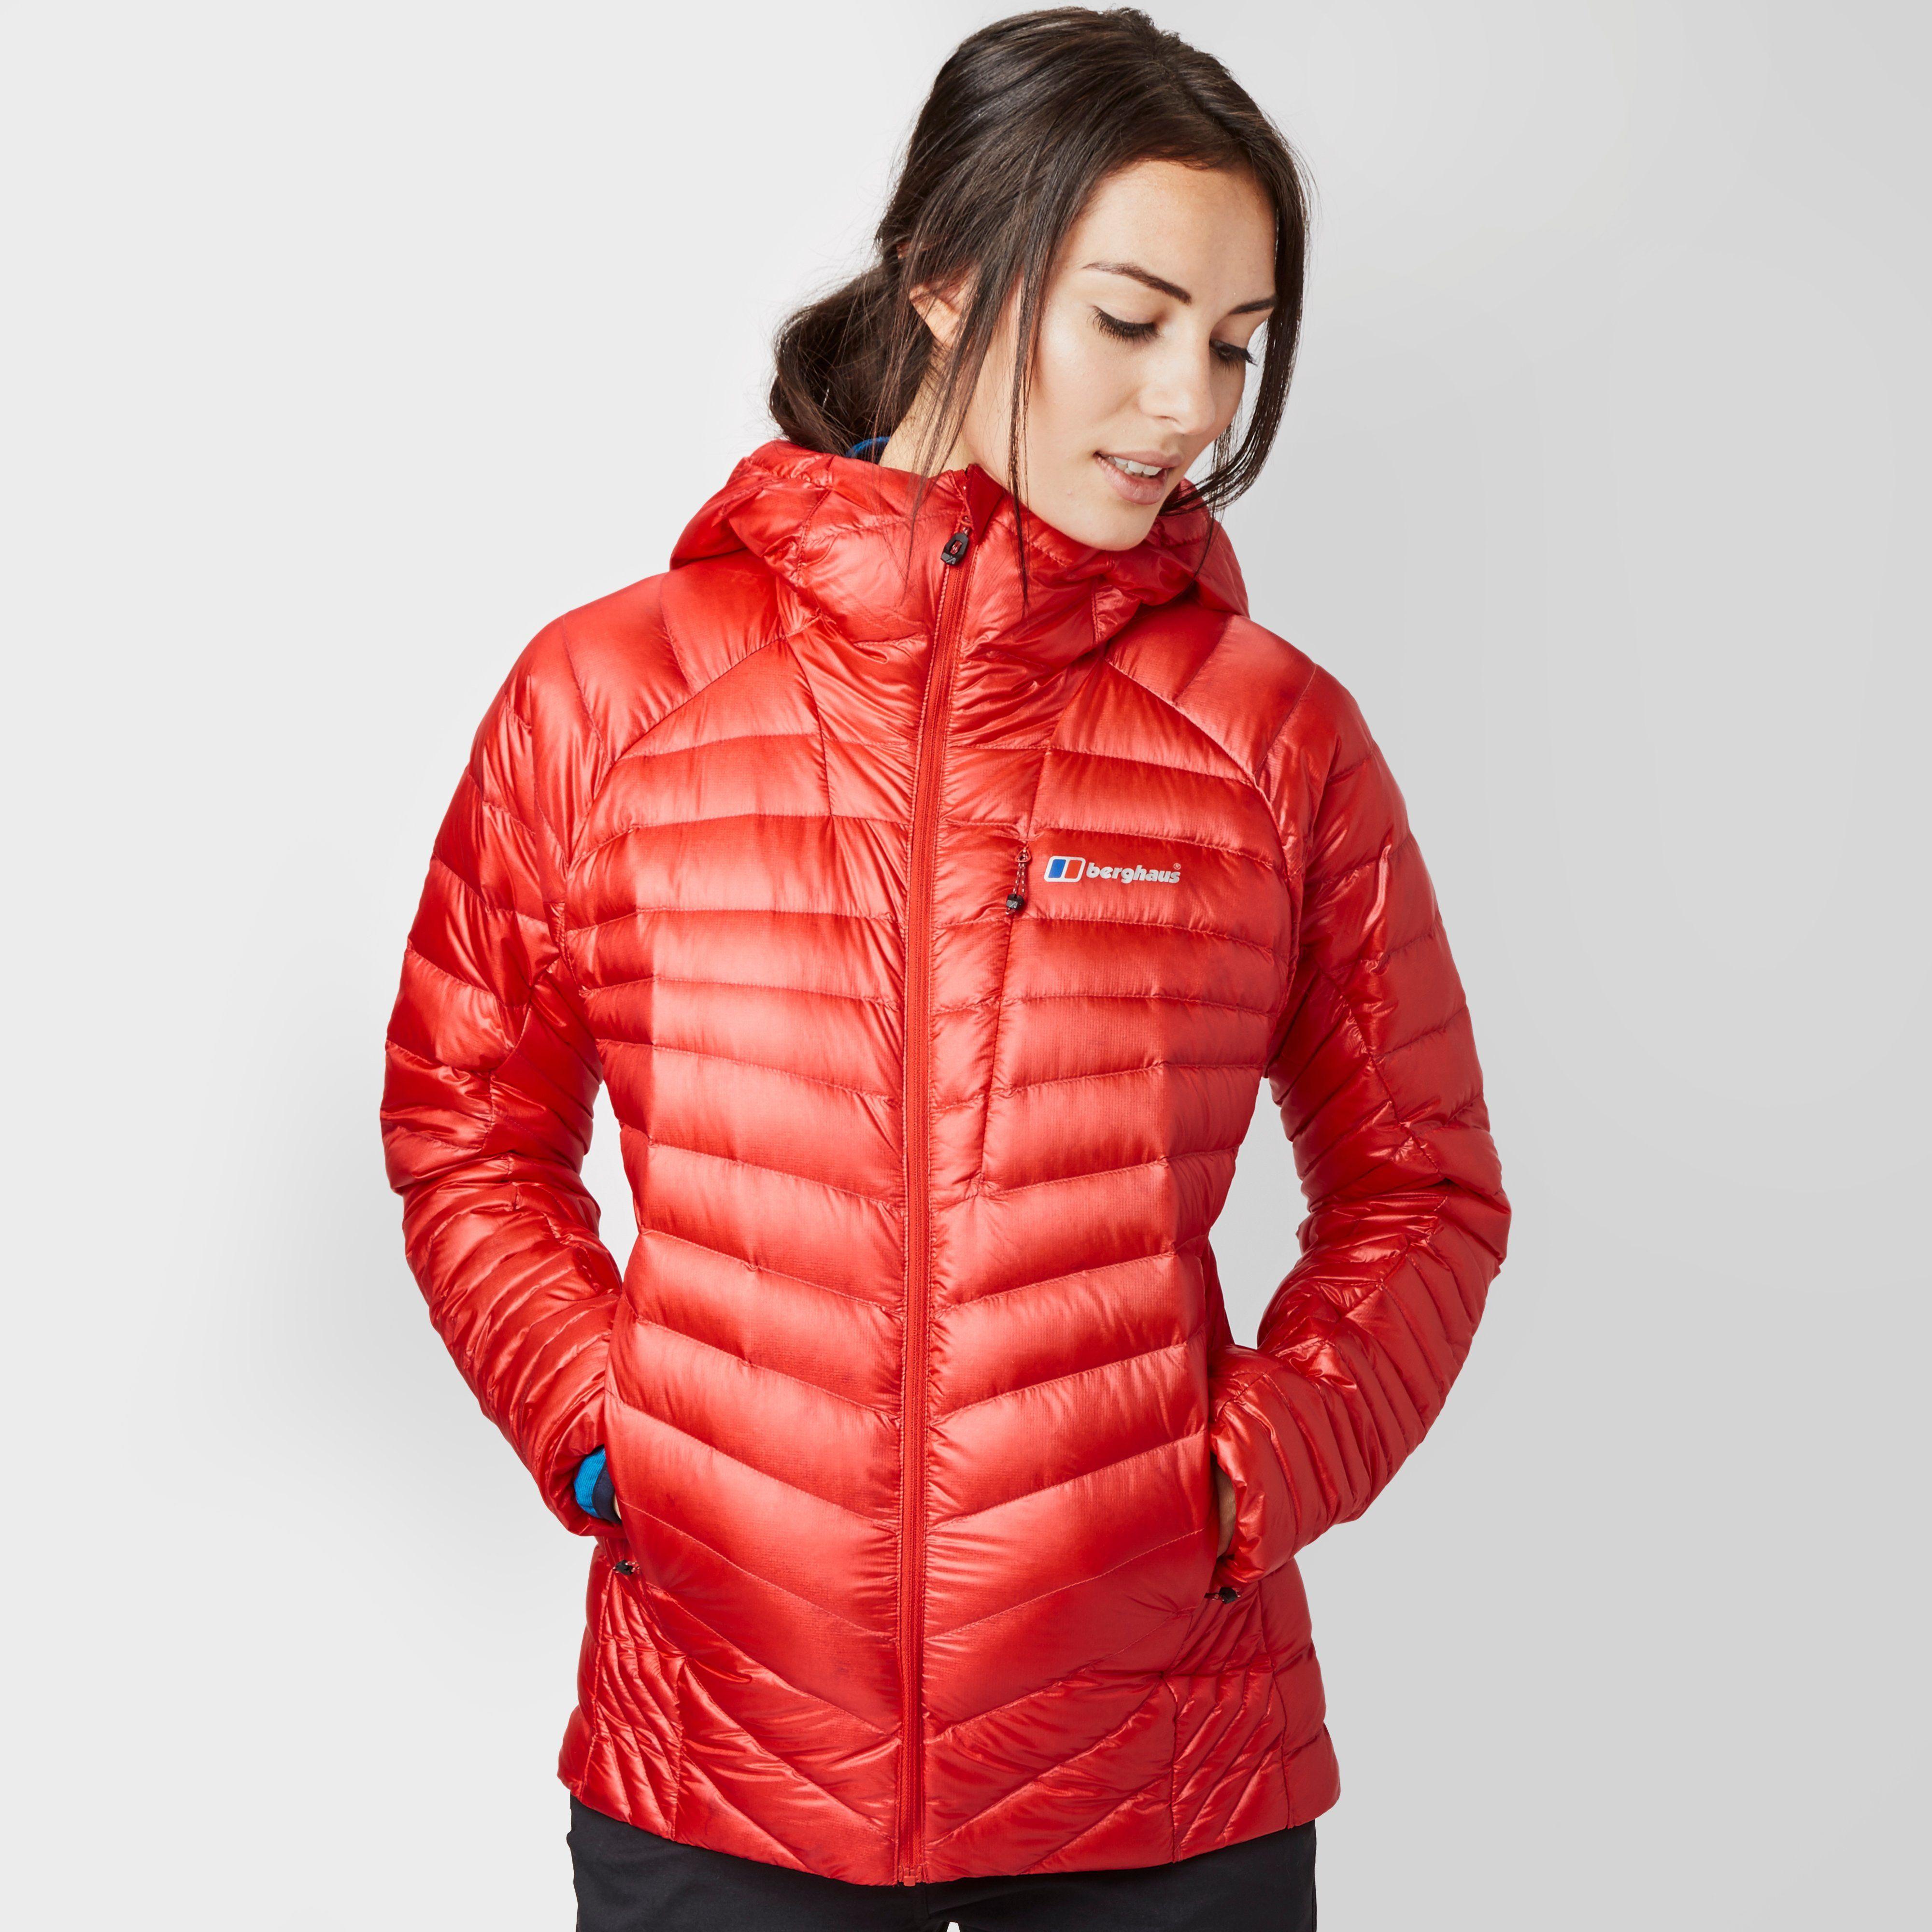 BERGHAUS Women's Extrem Micro Down Jacket